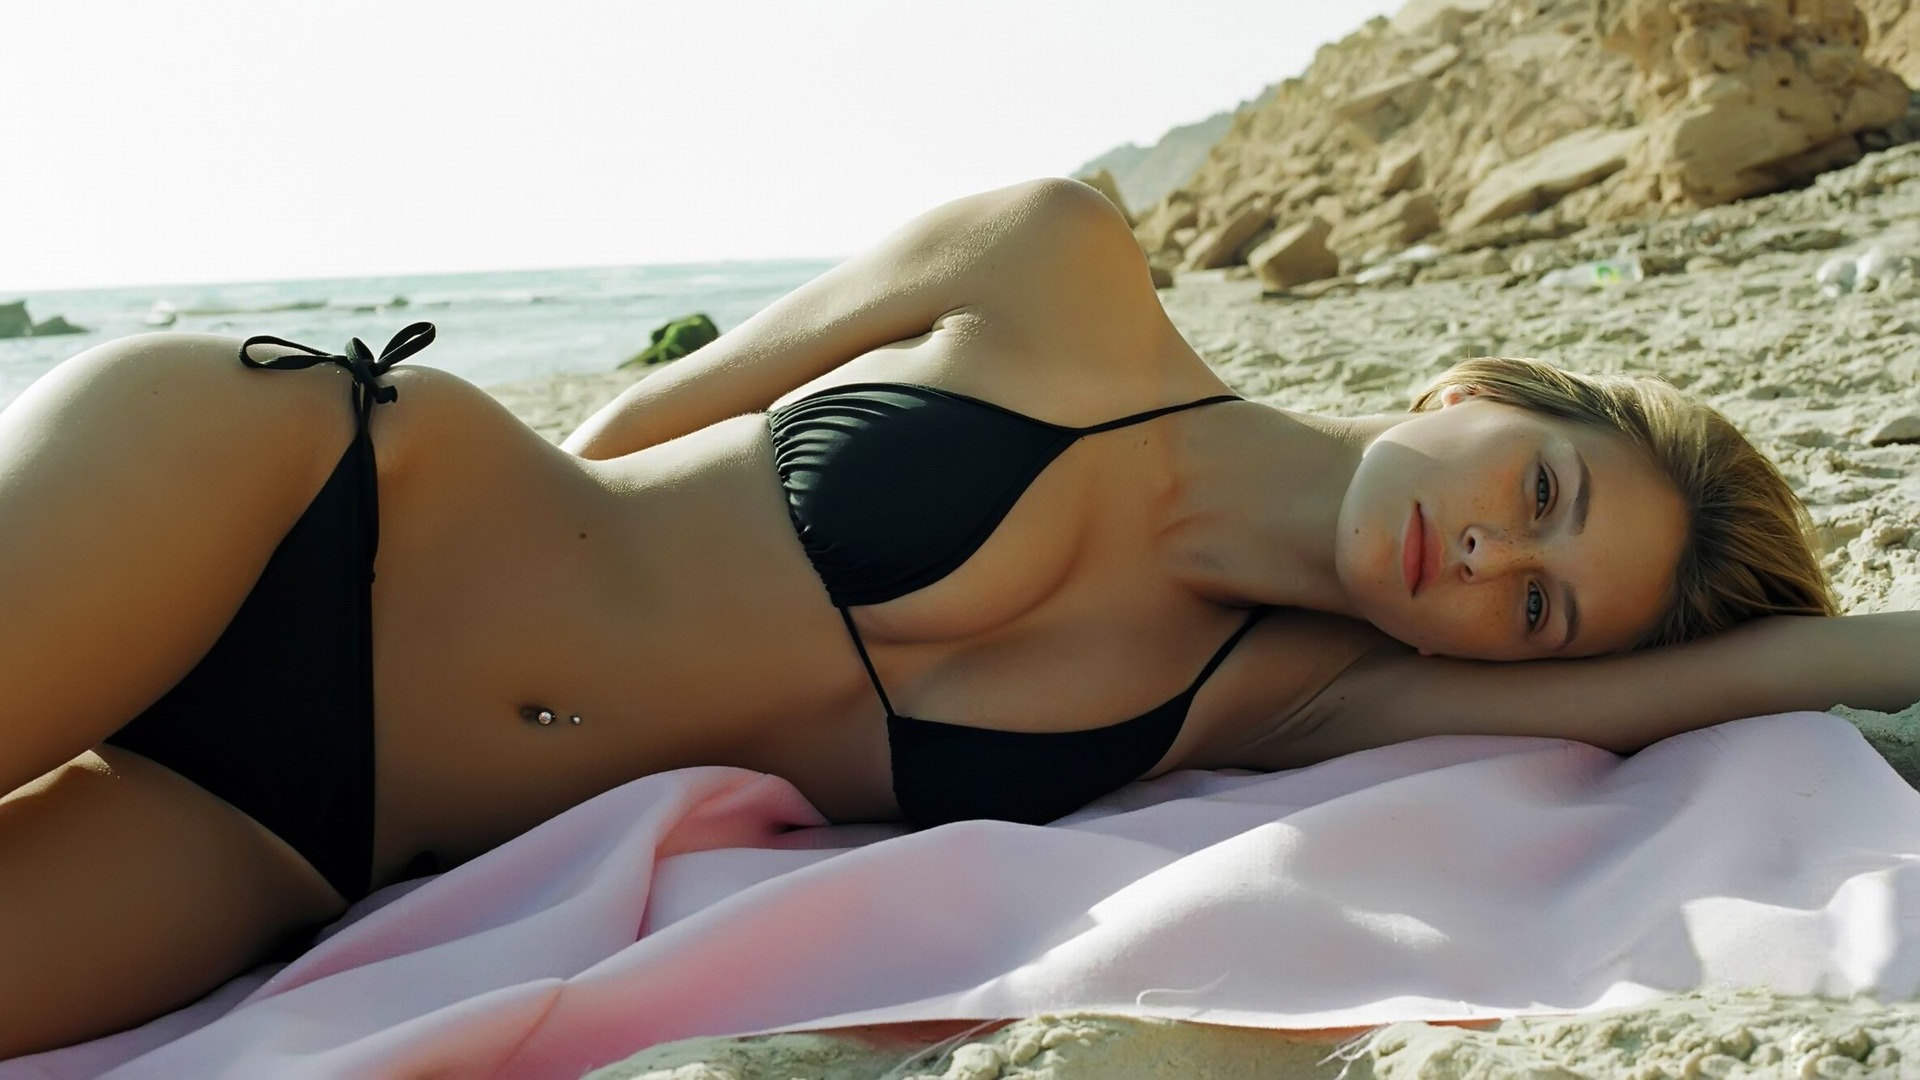 seaside-girls-93